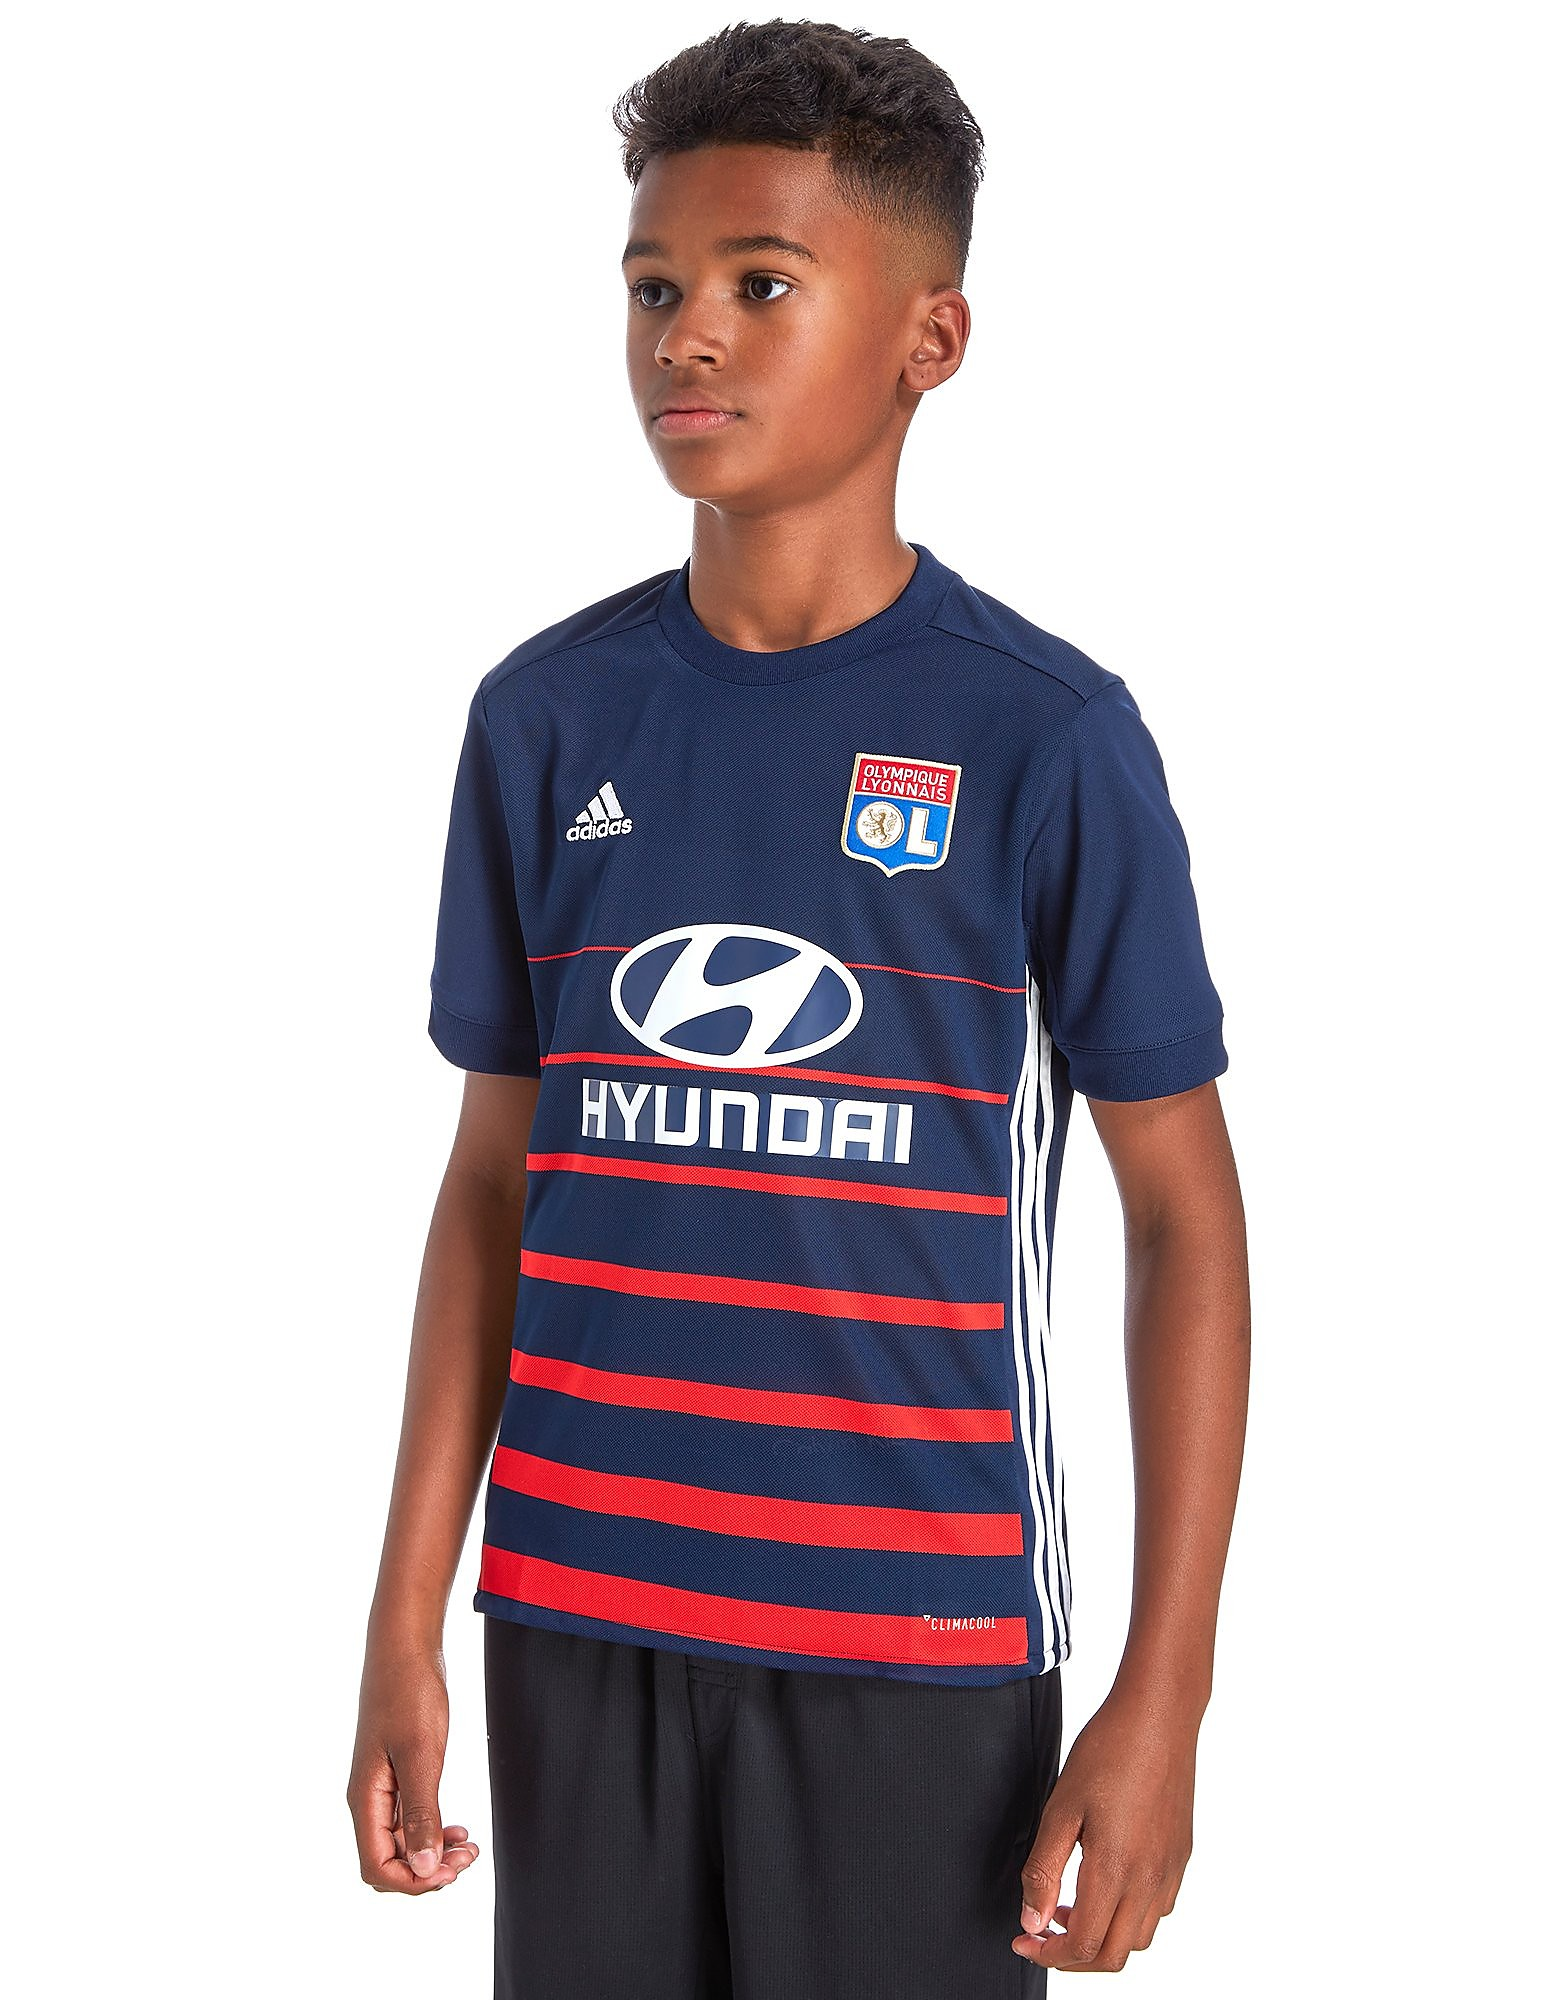 adidas Maillot officielle Olympique Lyonnais extérieur Junior 2017/2018